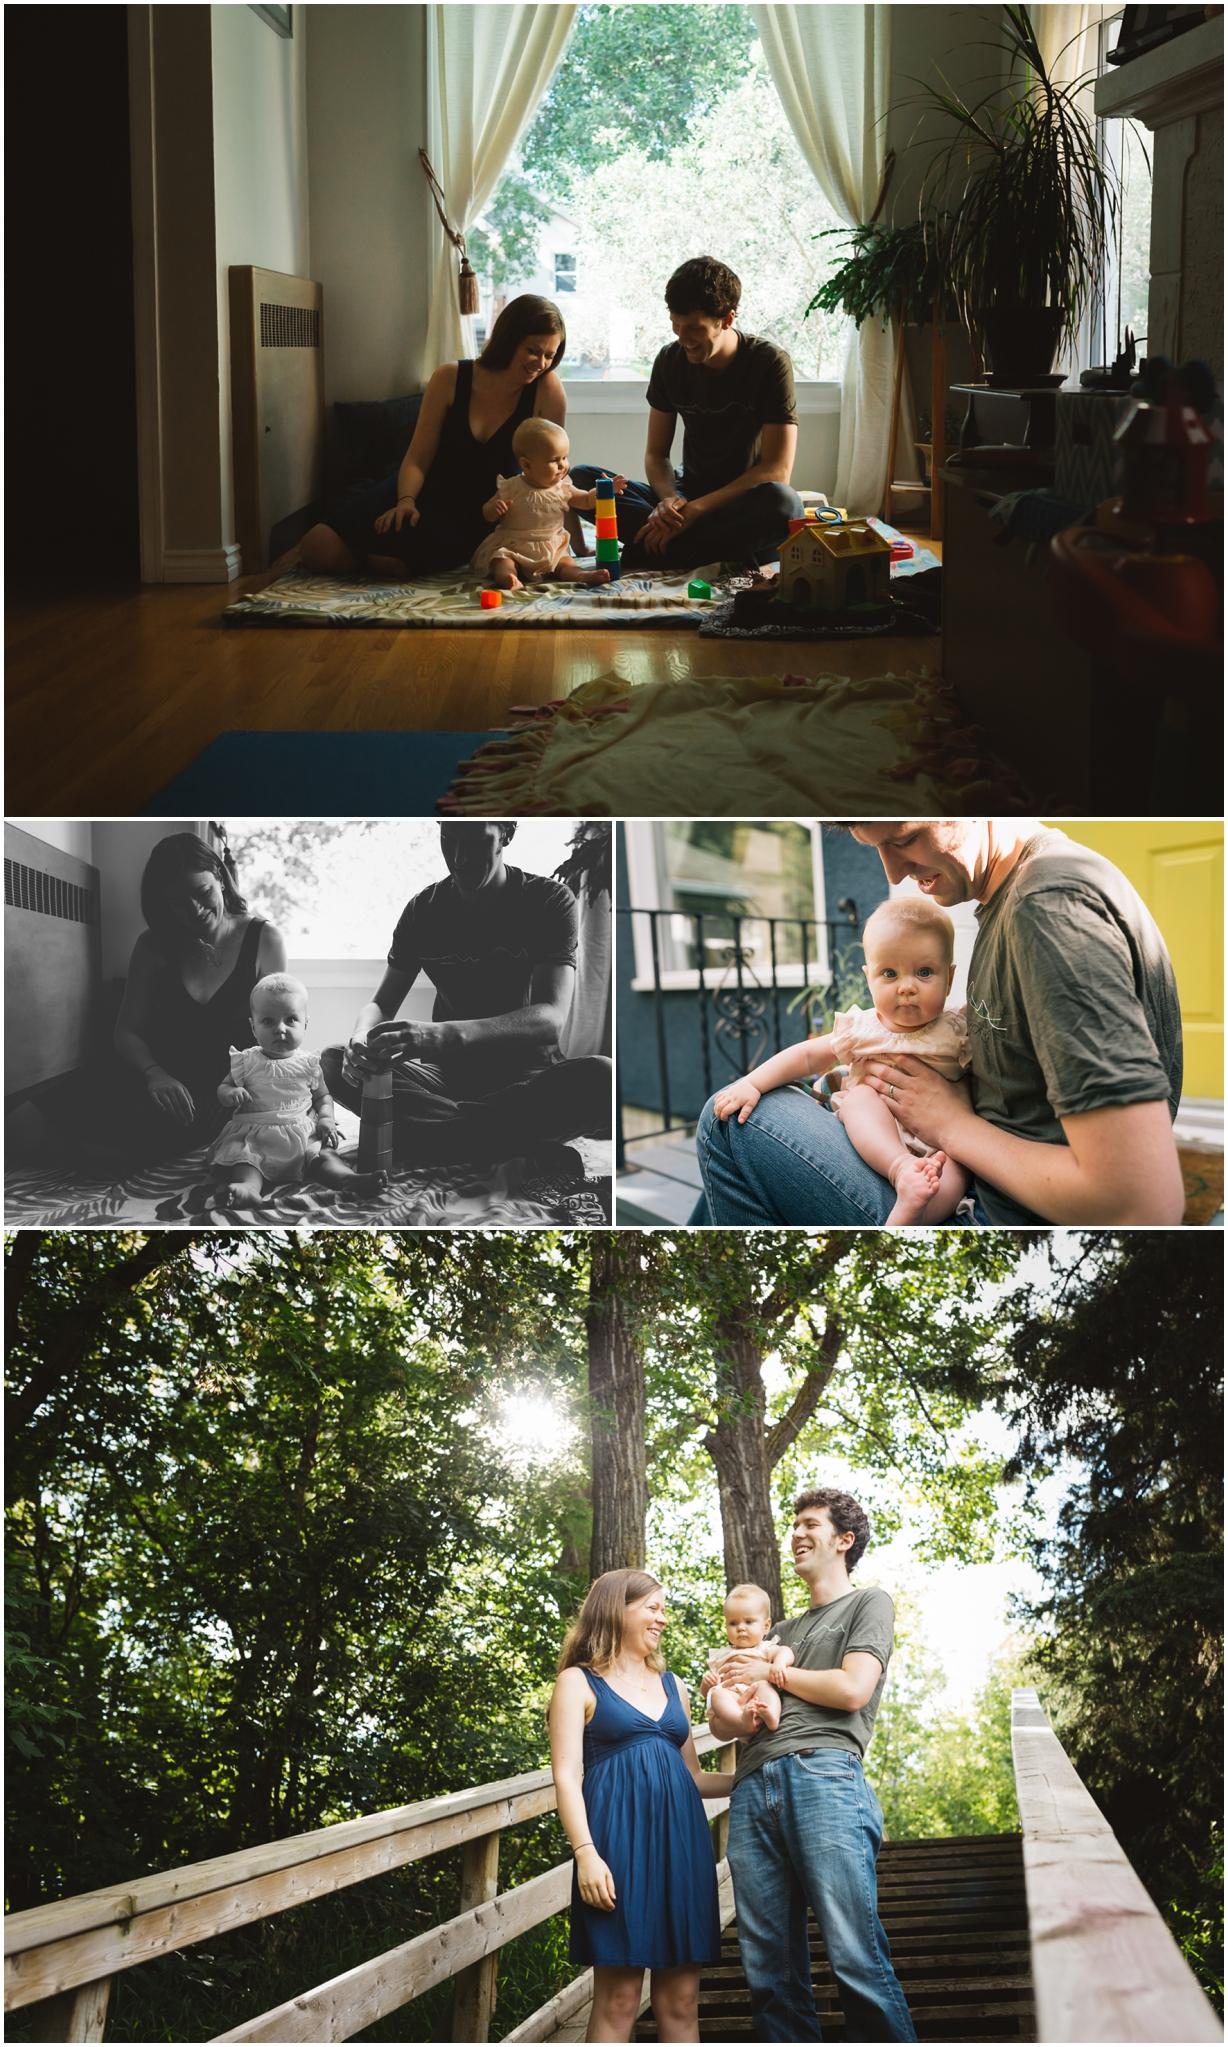 Edmonton family photographer mill creek ravine best of 2016 august